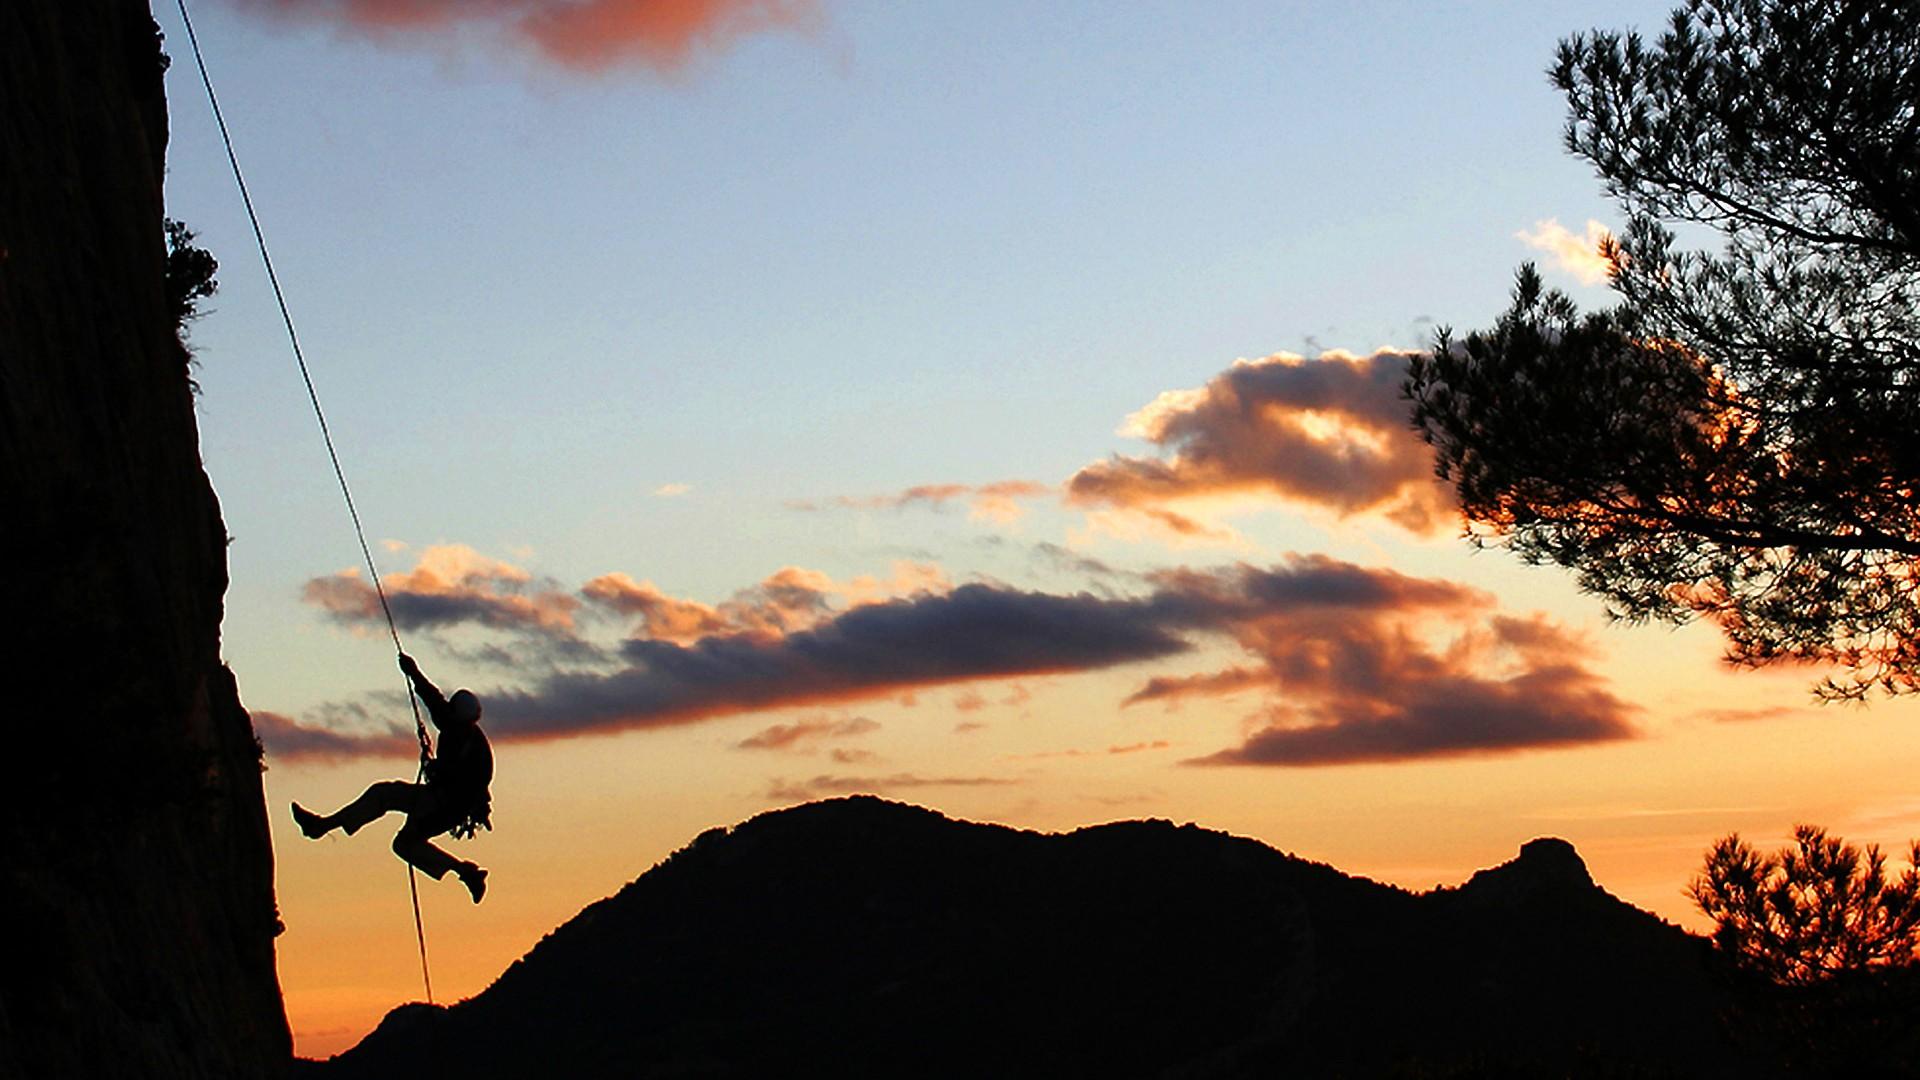 escalade_coucher_soleil_horizontal